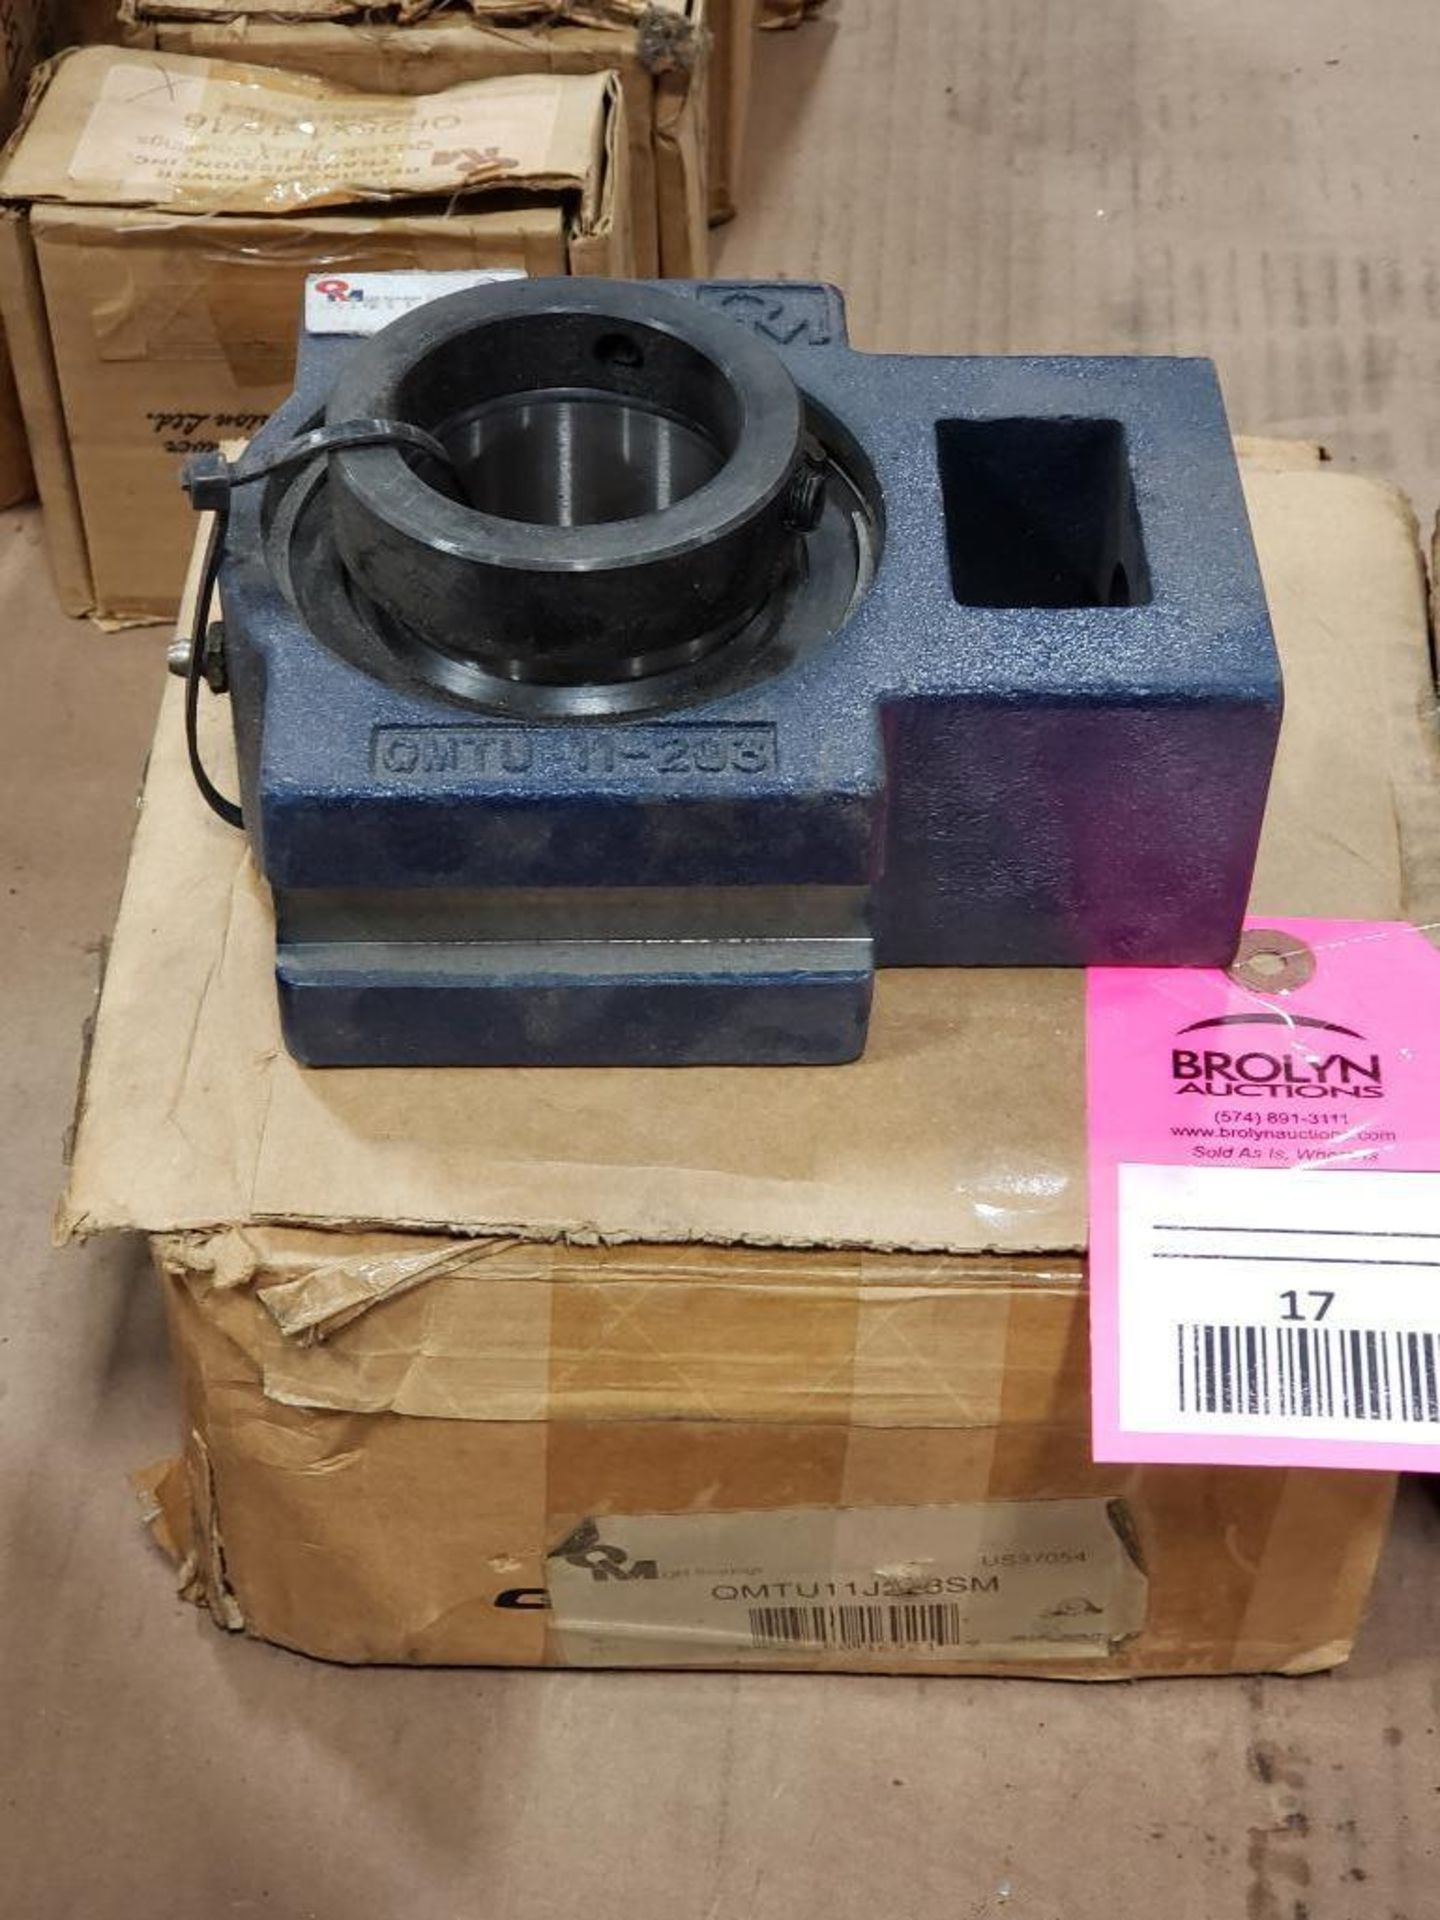 Lot 17 - QM bearing model QMTU11J203SM. New in box.